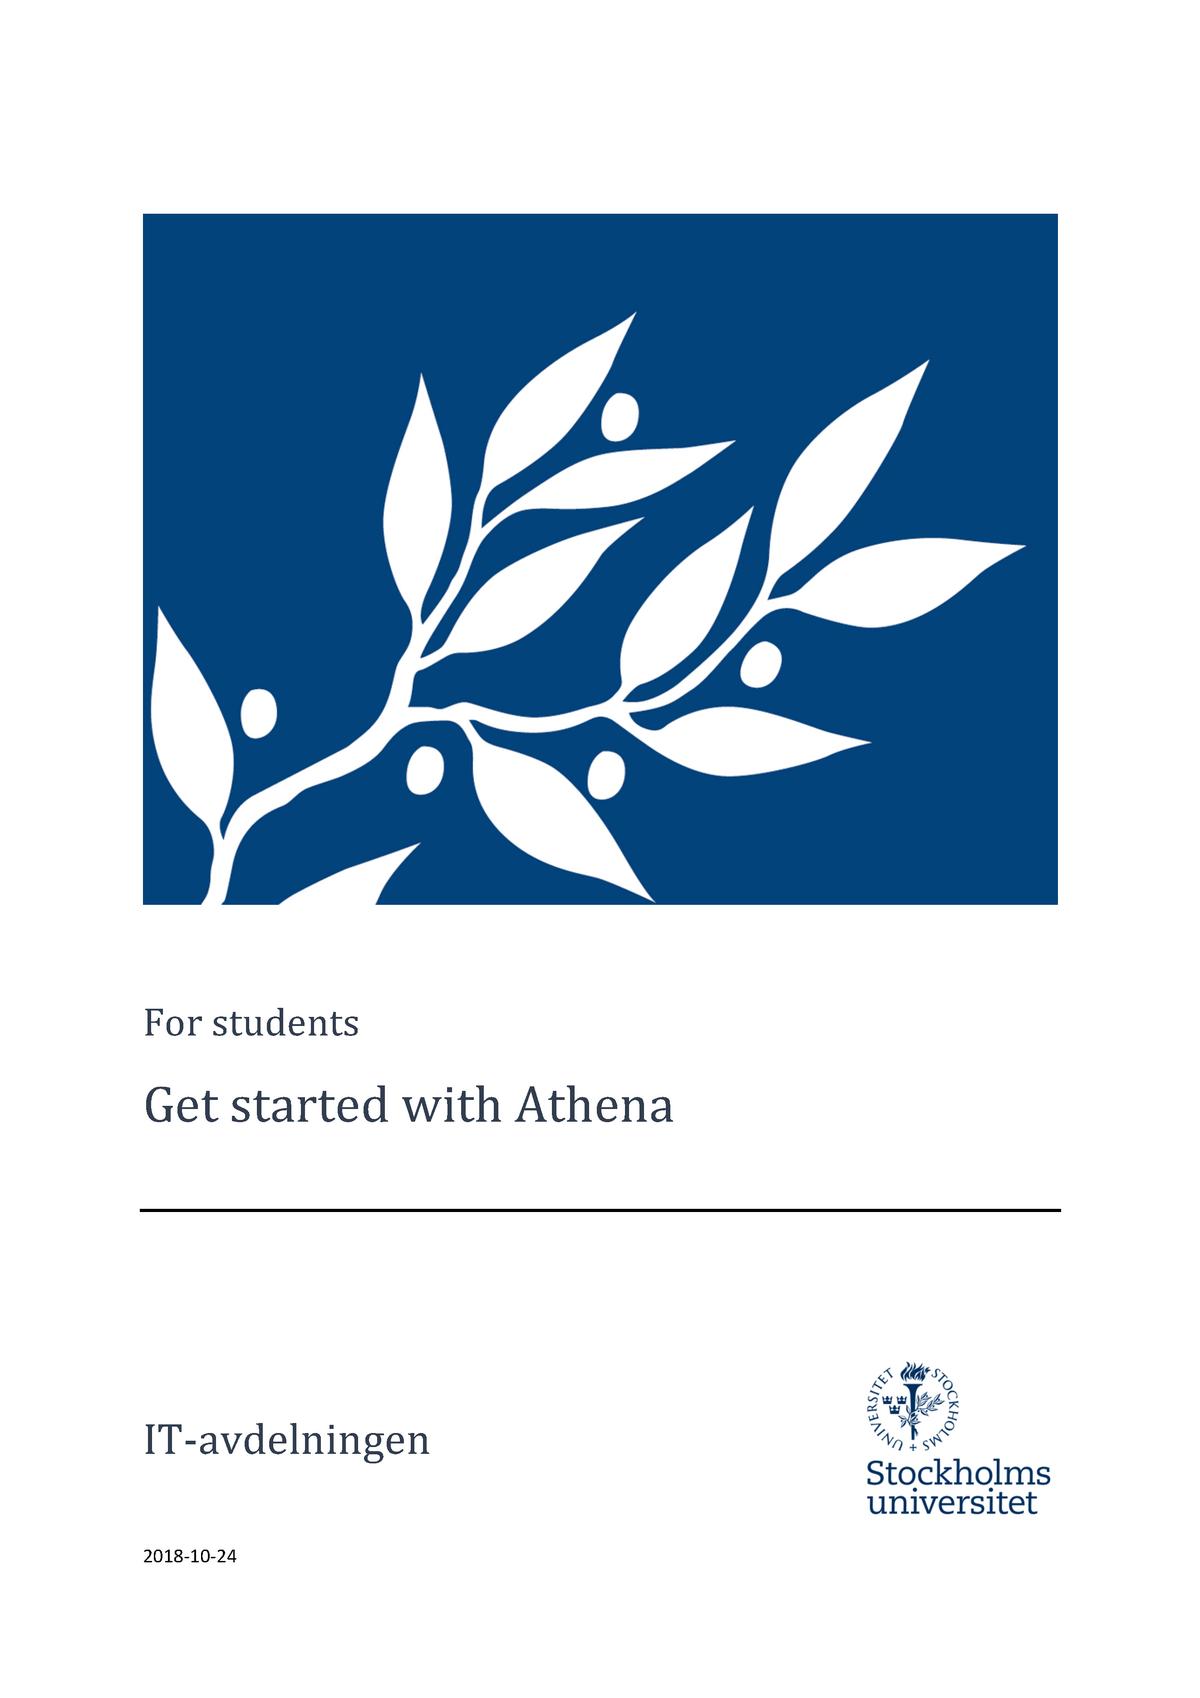 Stockholms Universitet Athena